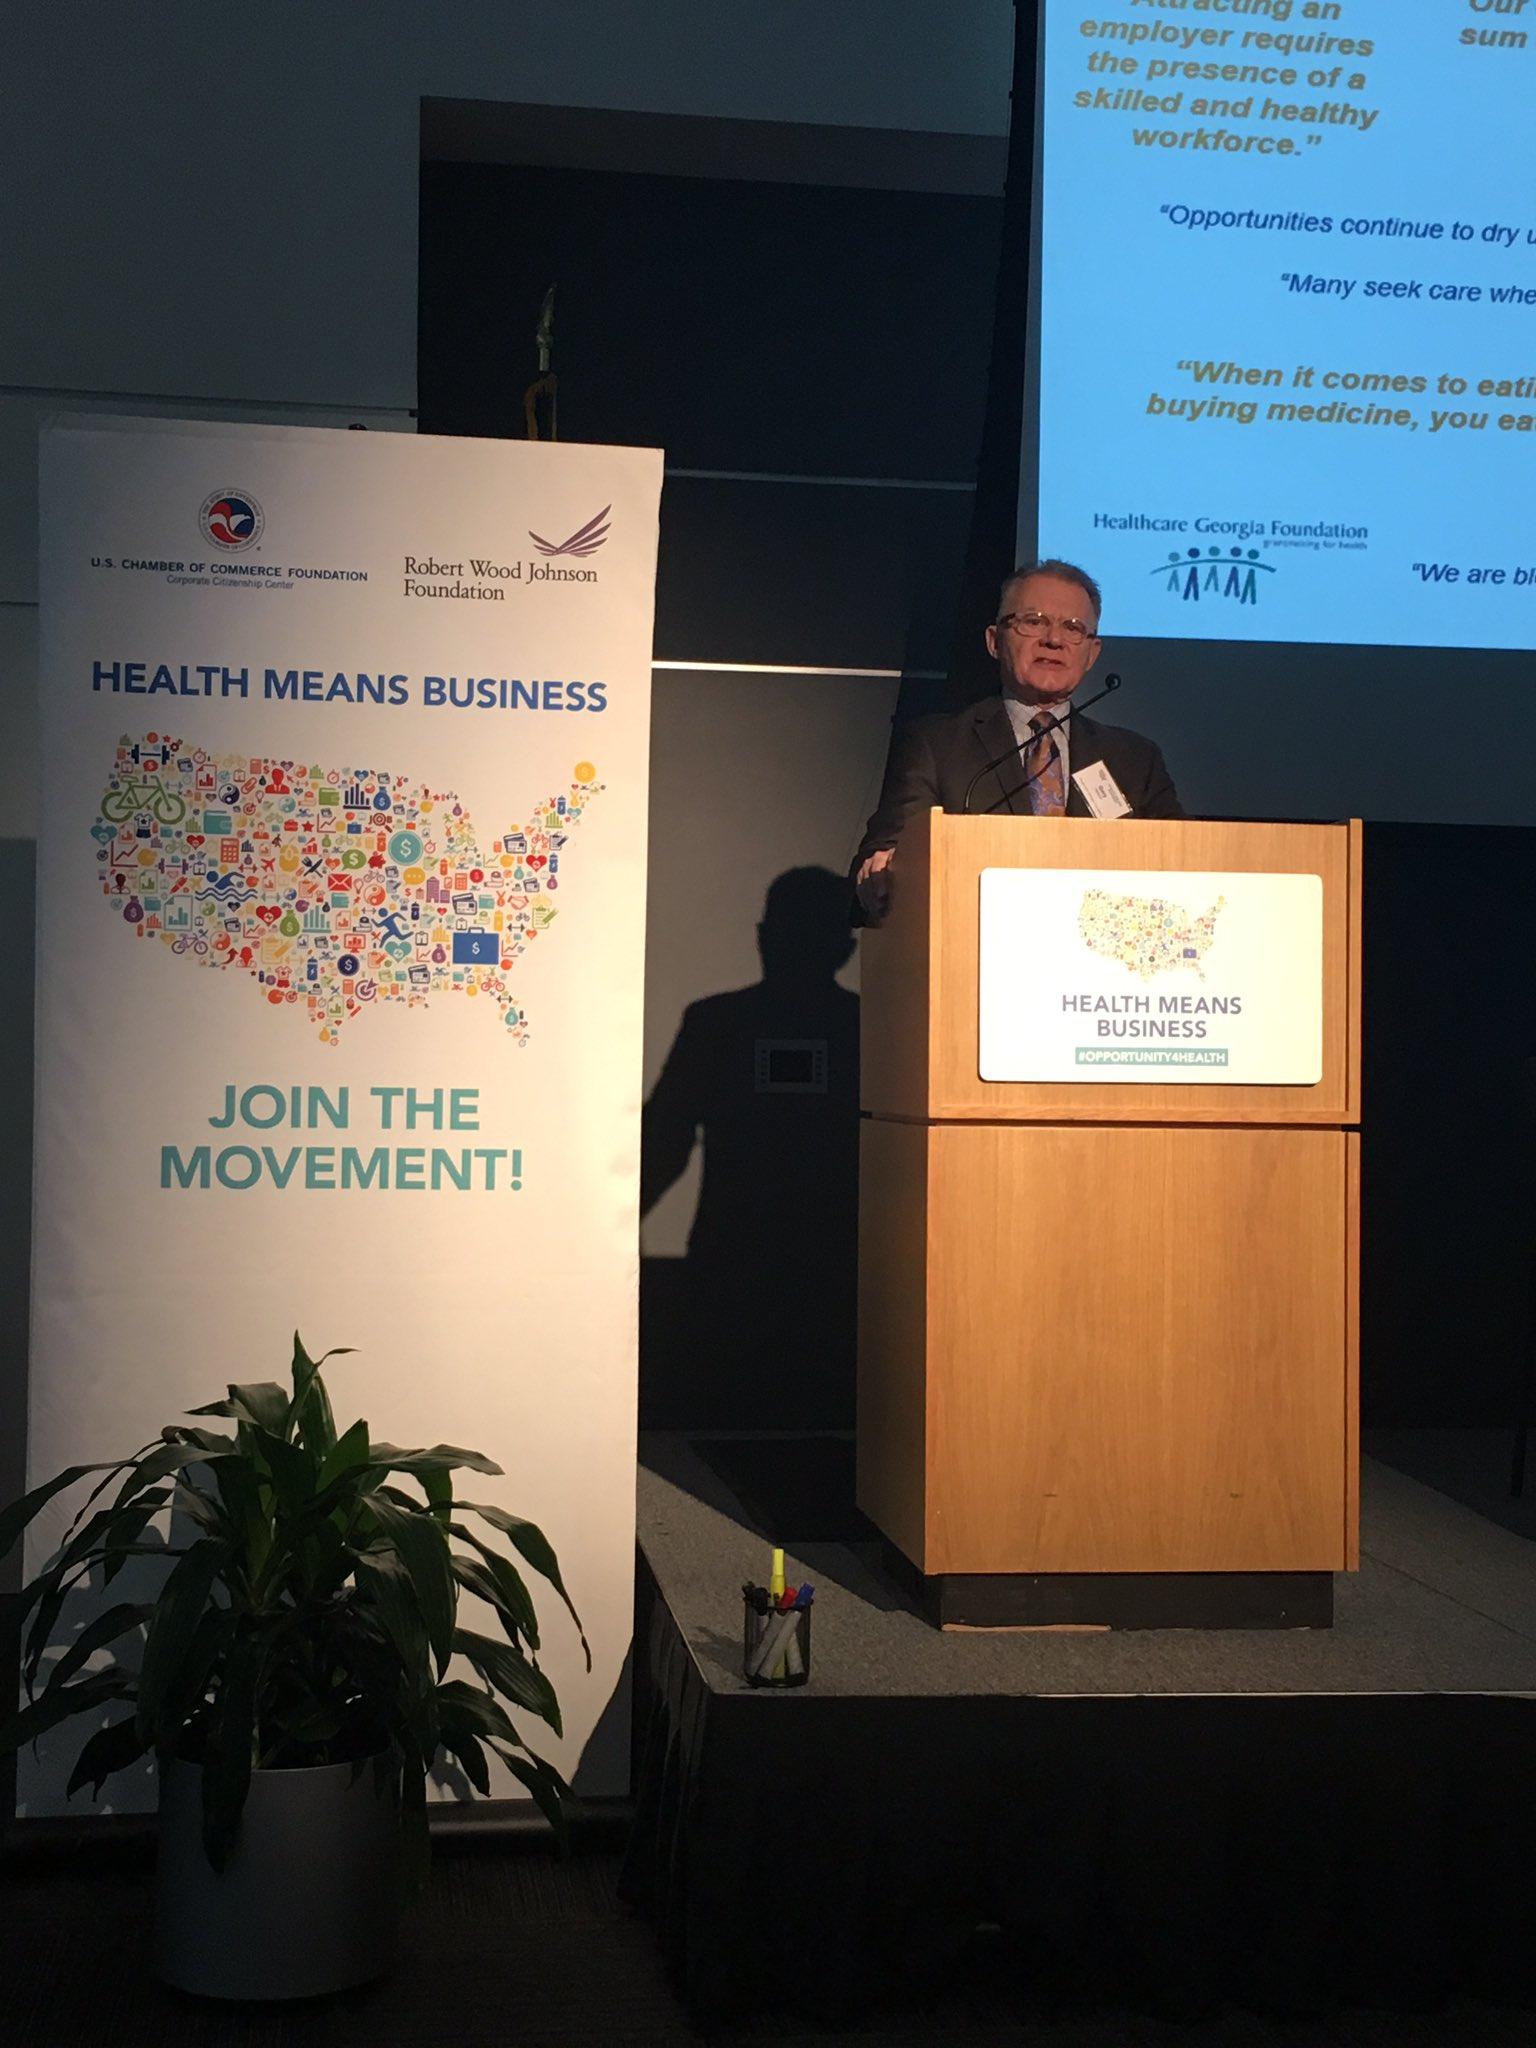 Dr. Nelson kicks off our 12th @HealthMeansBiz Forum in Columbus, GA. #opportunityforhealth https://t.co/c1e6cYs675